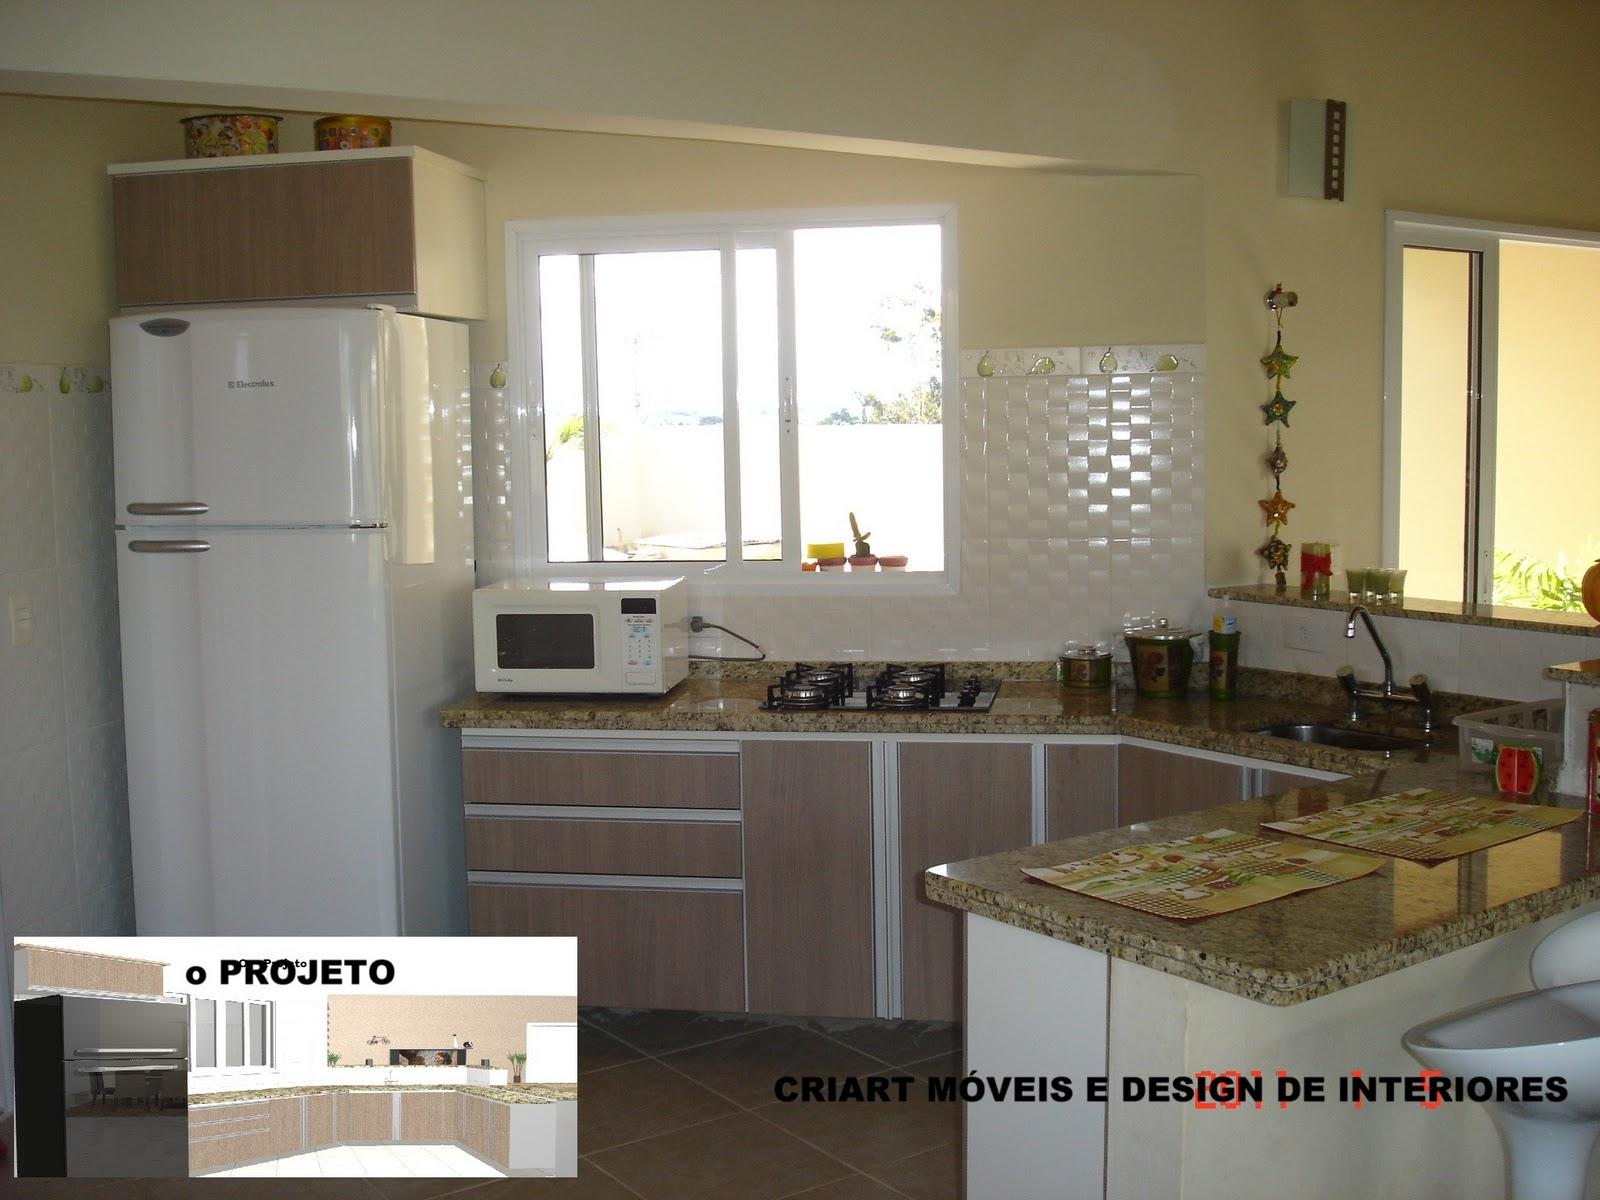 #8B7940  salas de jantar cooktops coifas e fornos de diversos fabricantes 1600x1200 px Sala De Cozinha De Design De Interiores_423 Imagens